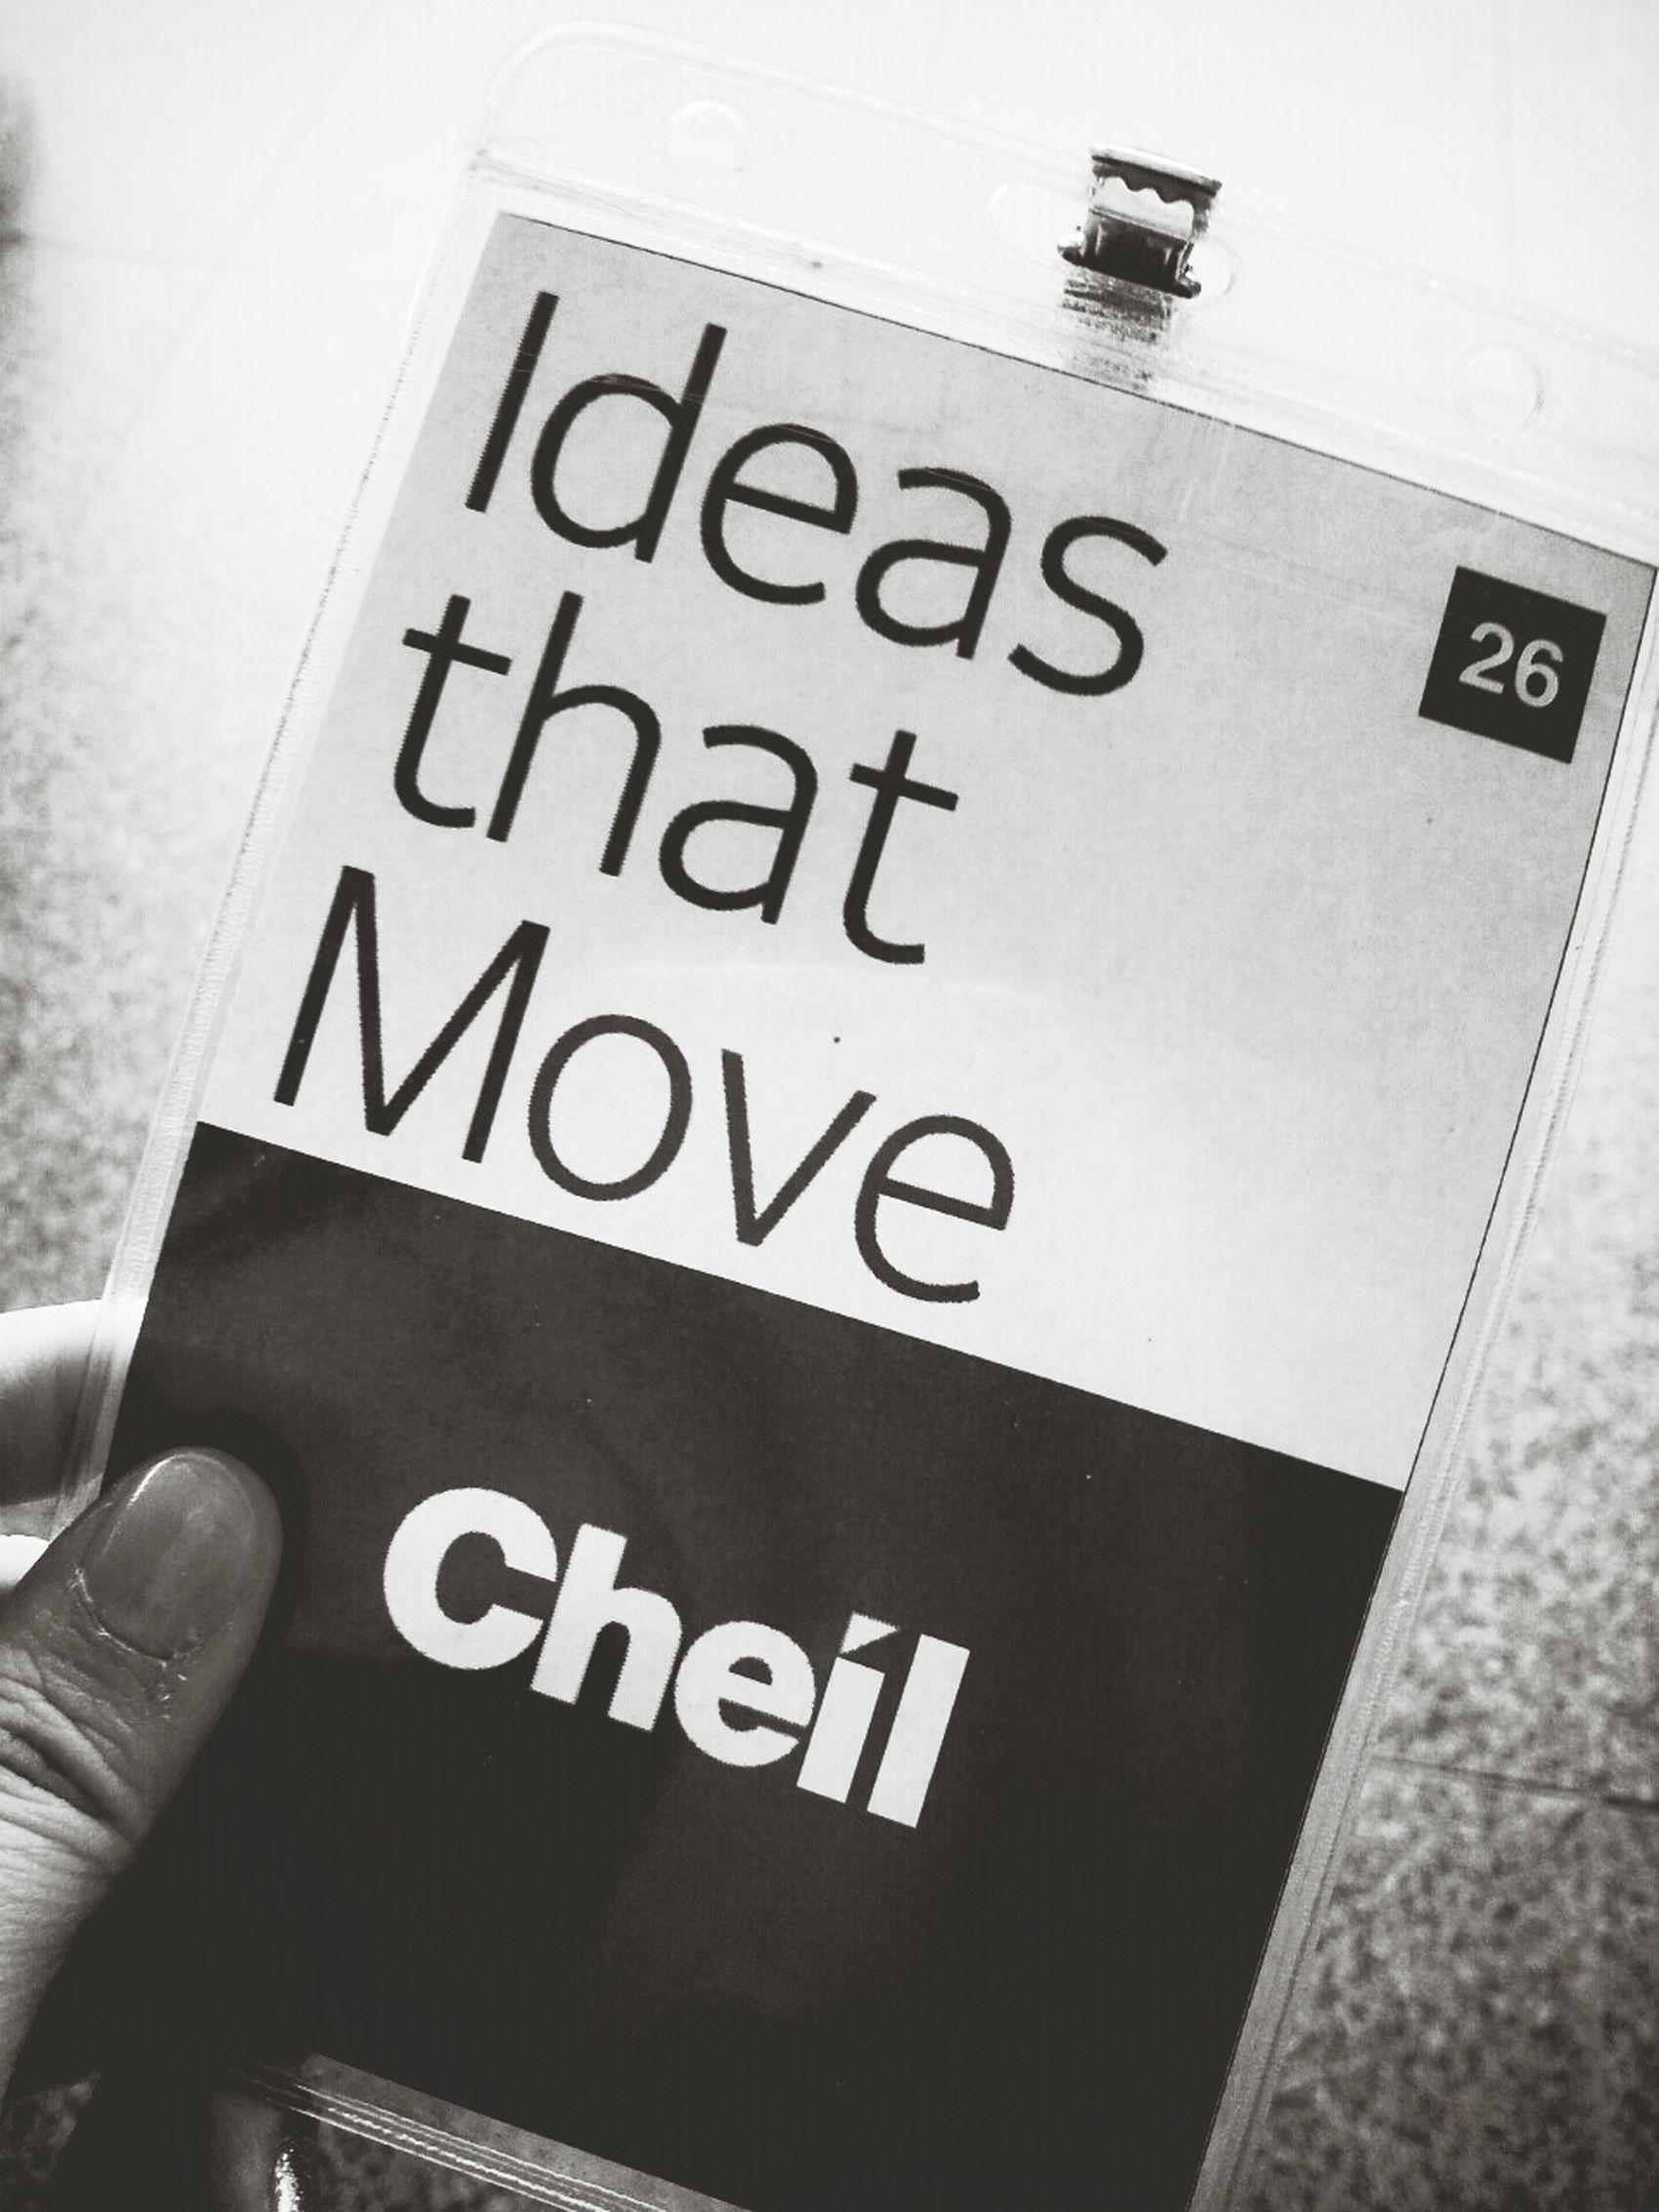 Cheil Ideas 이태원 제일기획 IDEAS THAT MOVE 제일기획 카피